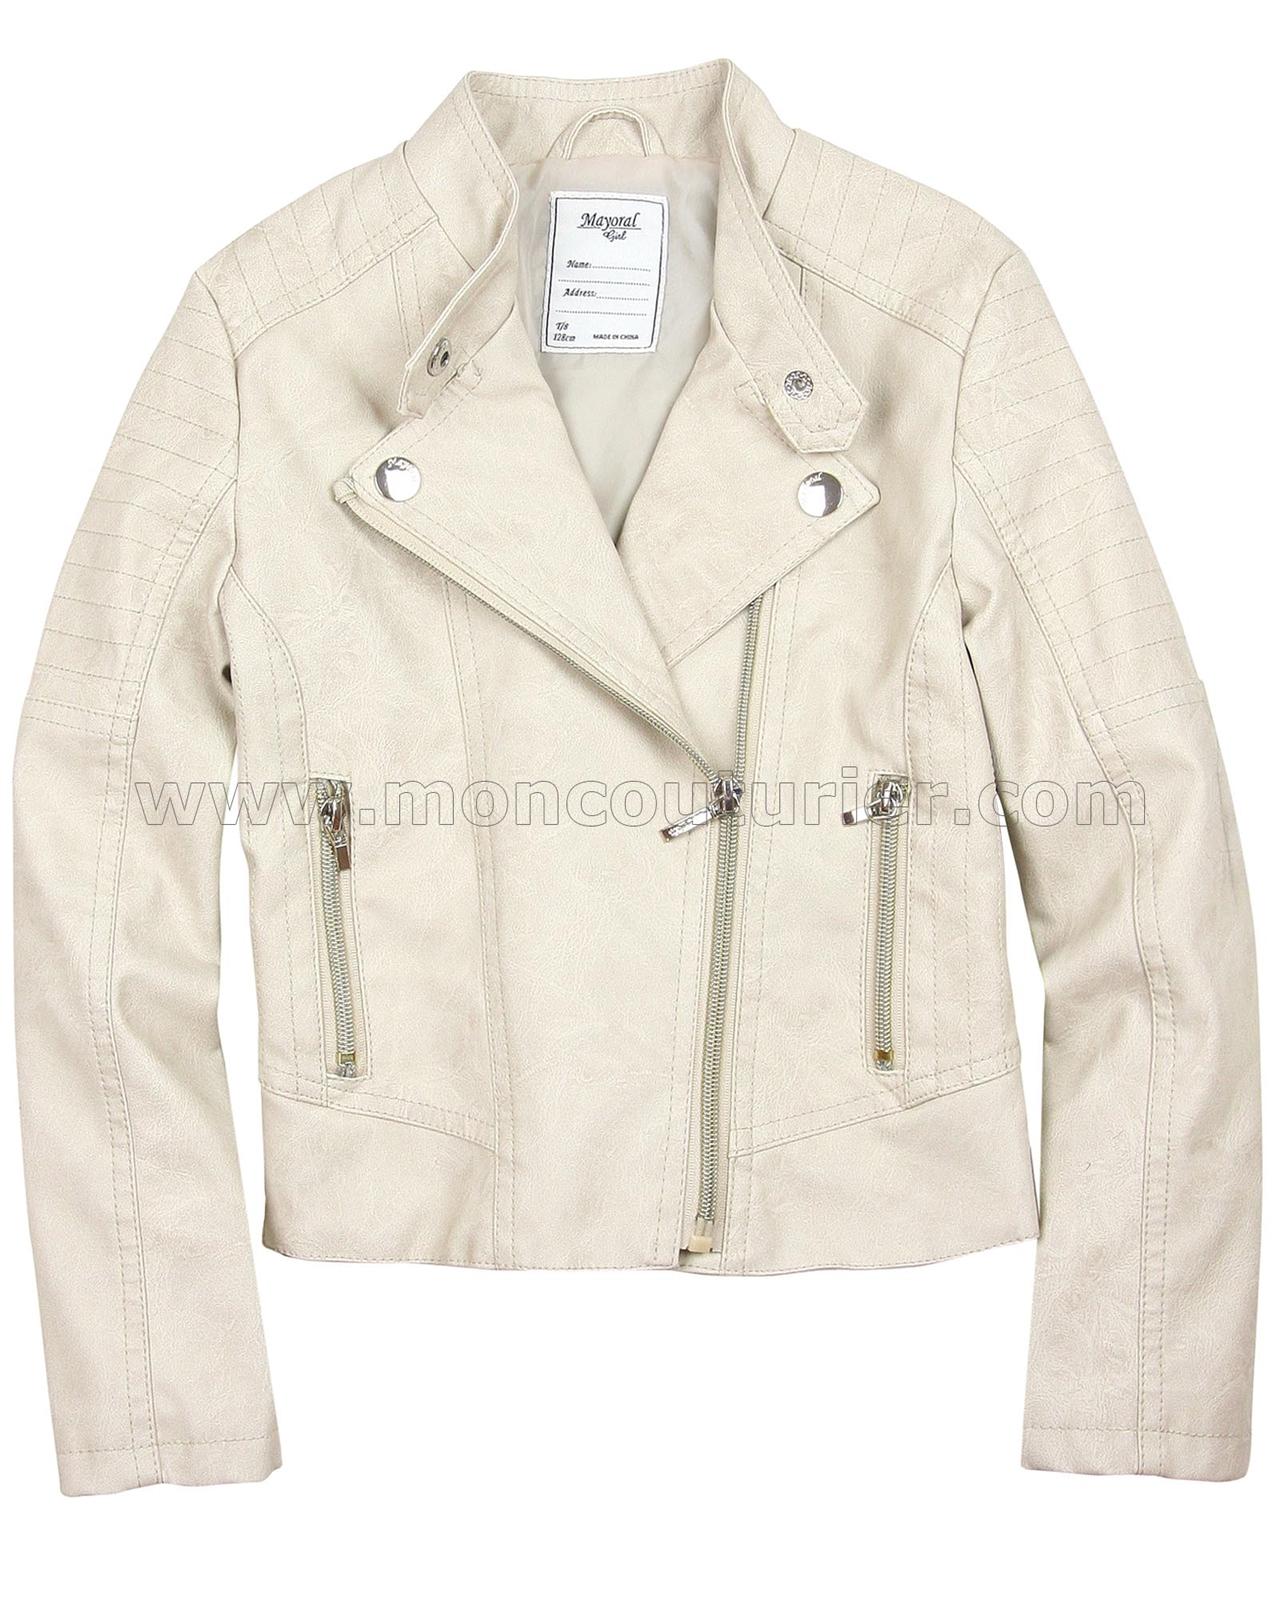 d8736f6b5 MAYORAL Girl's Pleather Jacket, Sizes 8-16